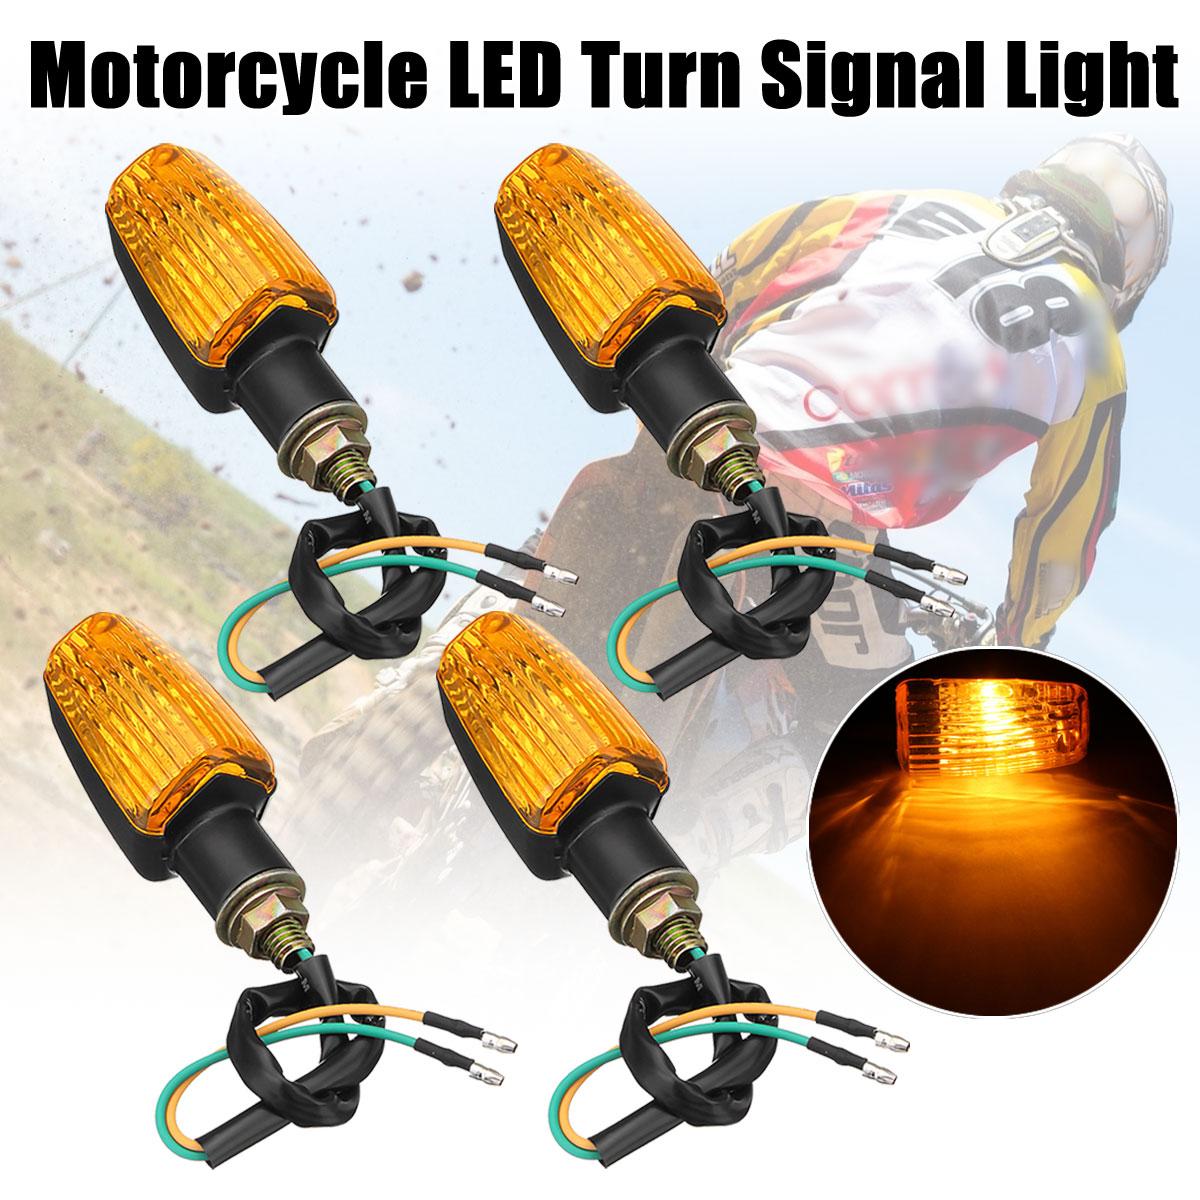 4pcs Universal Motorcycle Mini Turn Signal Blinker Indicator LED Lights Bulb Amber Yellow Lamps DC 12V For Honda/Suzuki/Yamaha